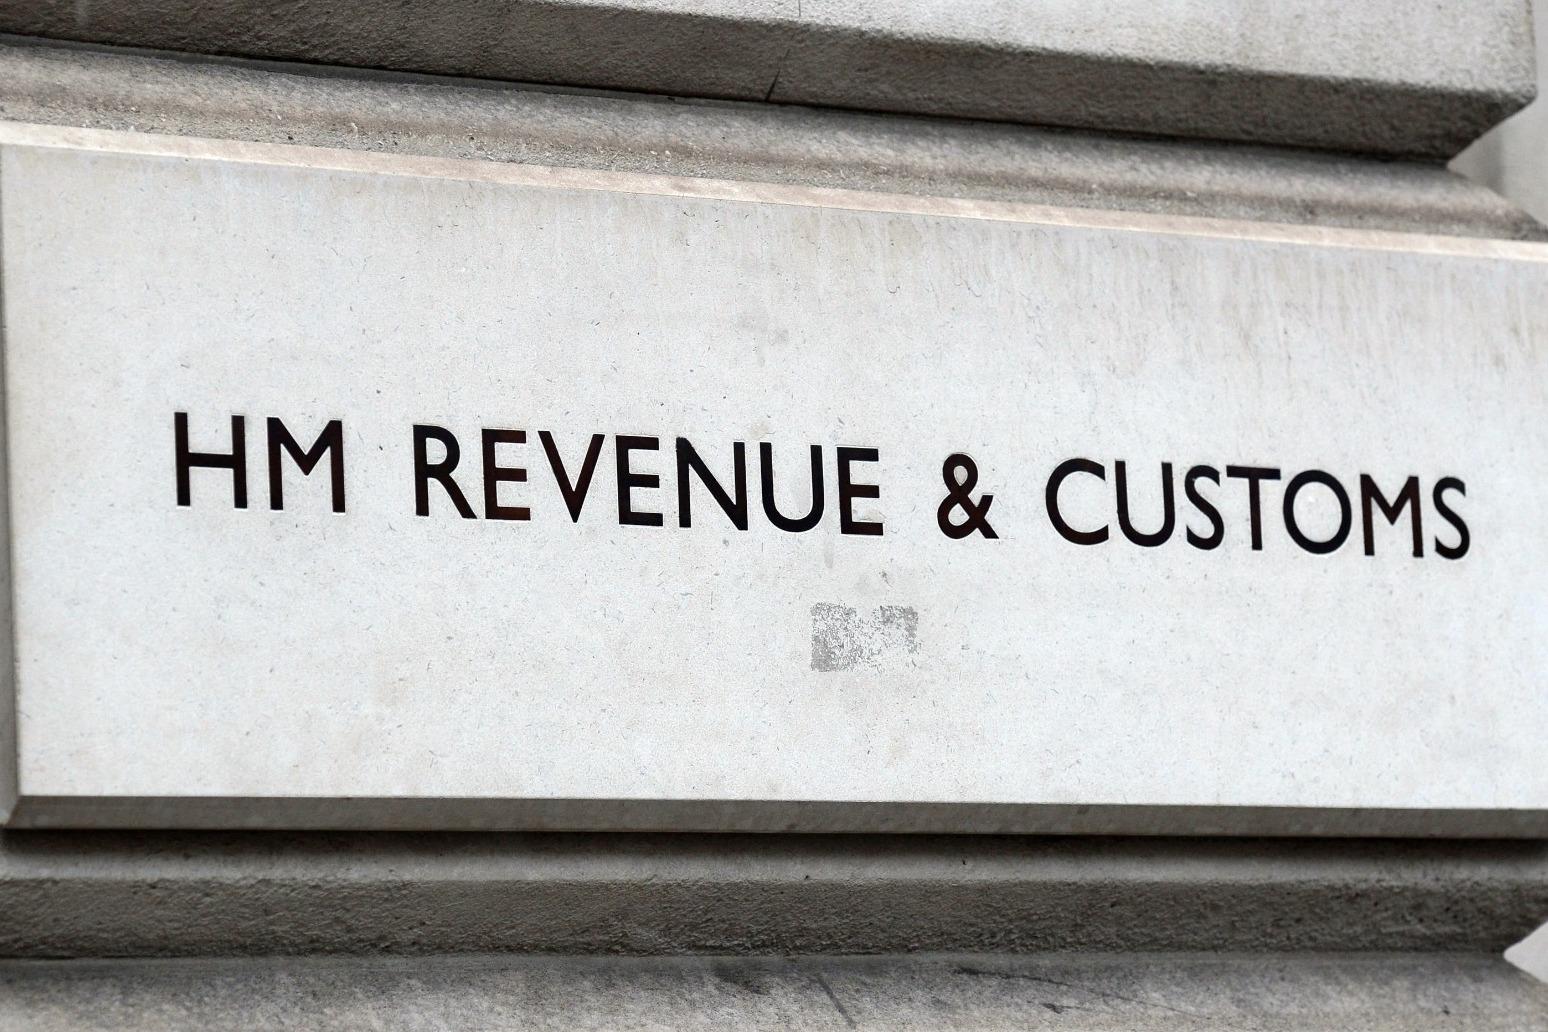 11 million meet HMRC tax deadline